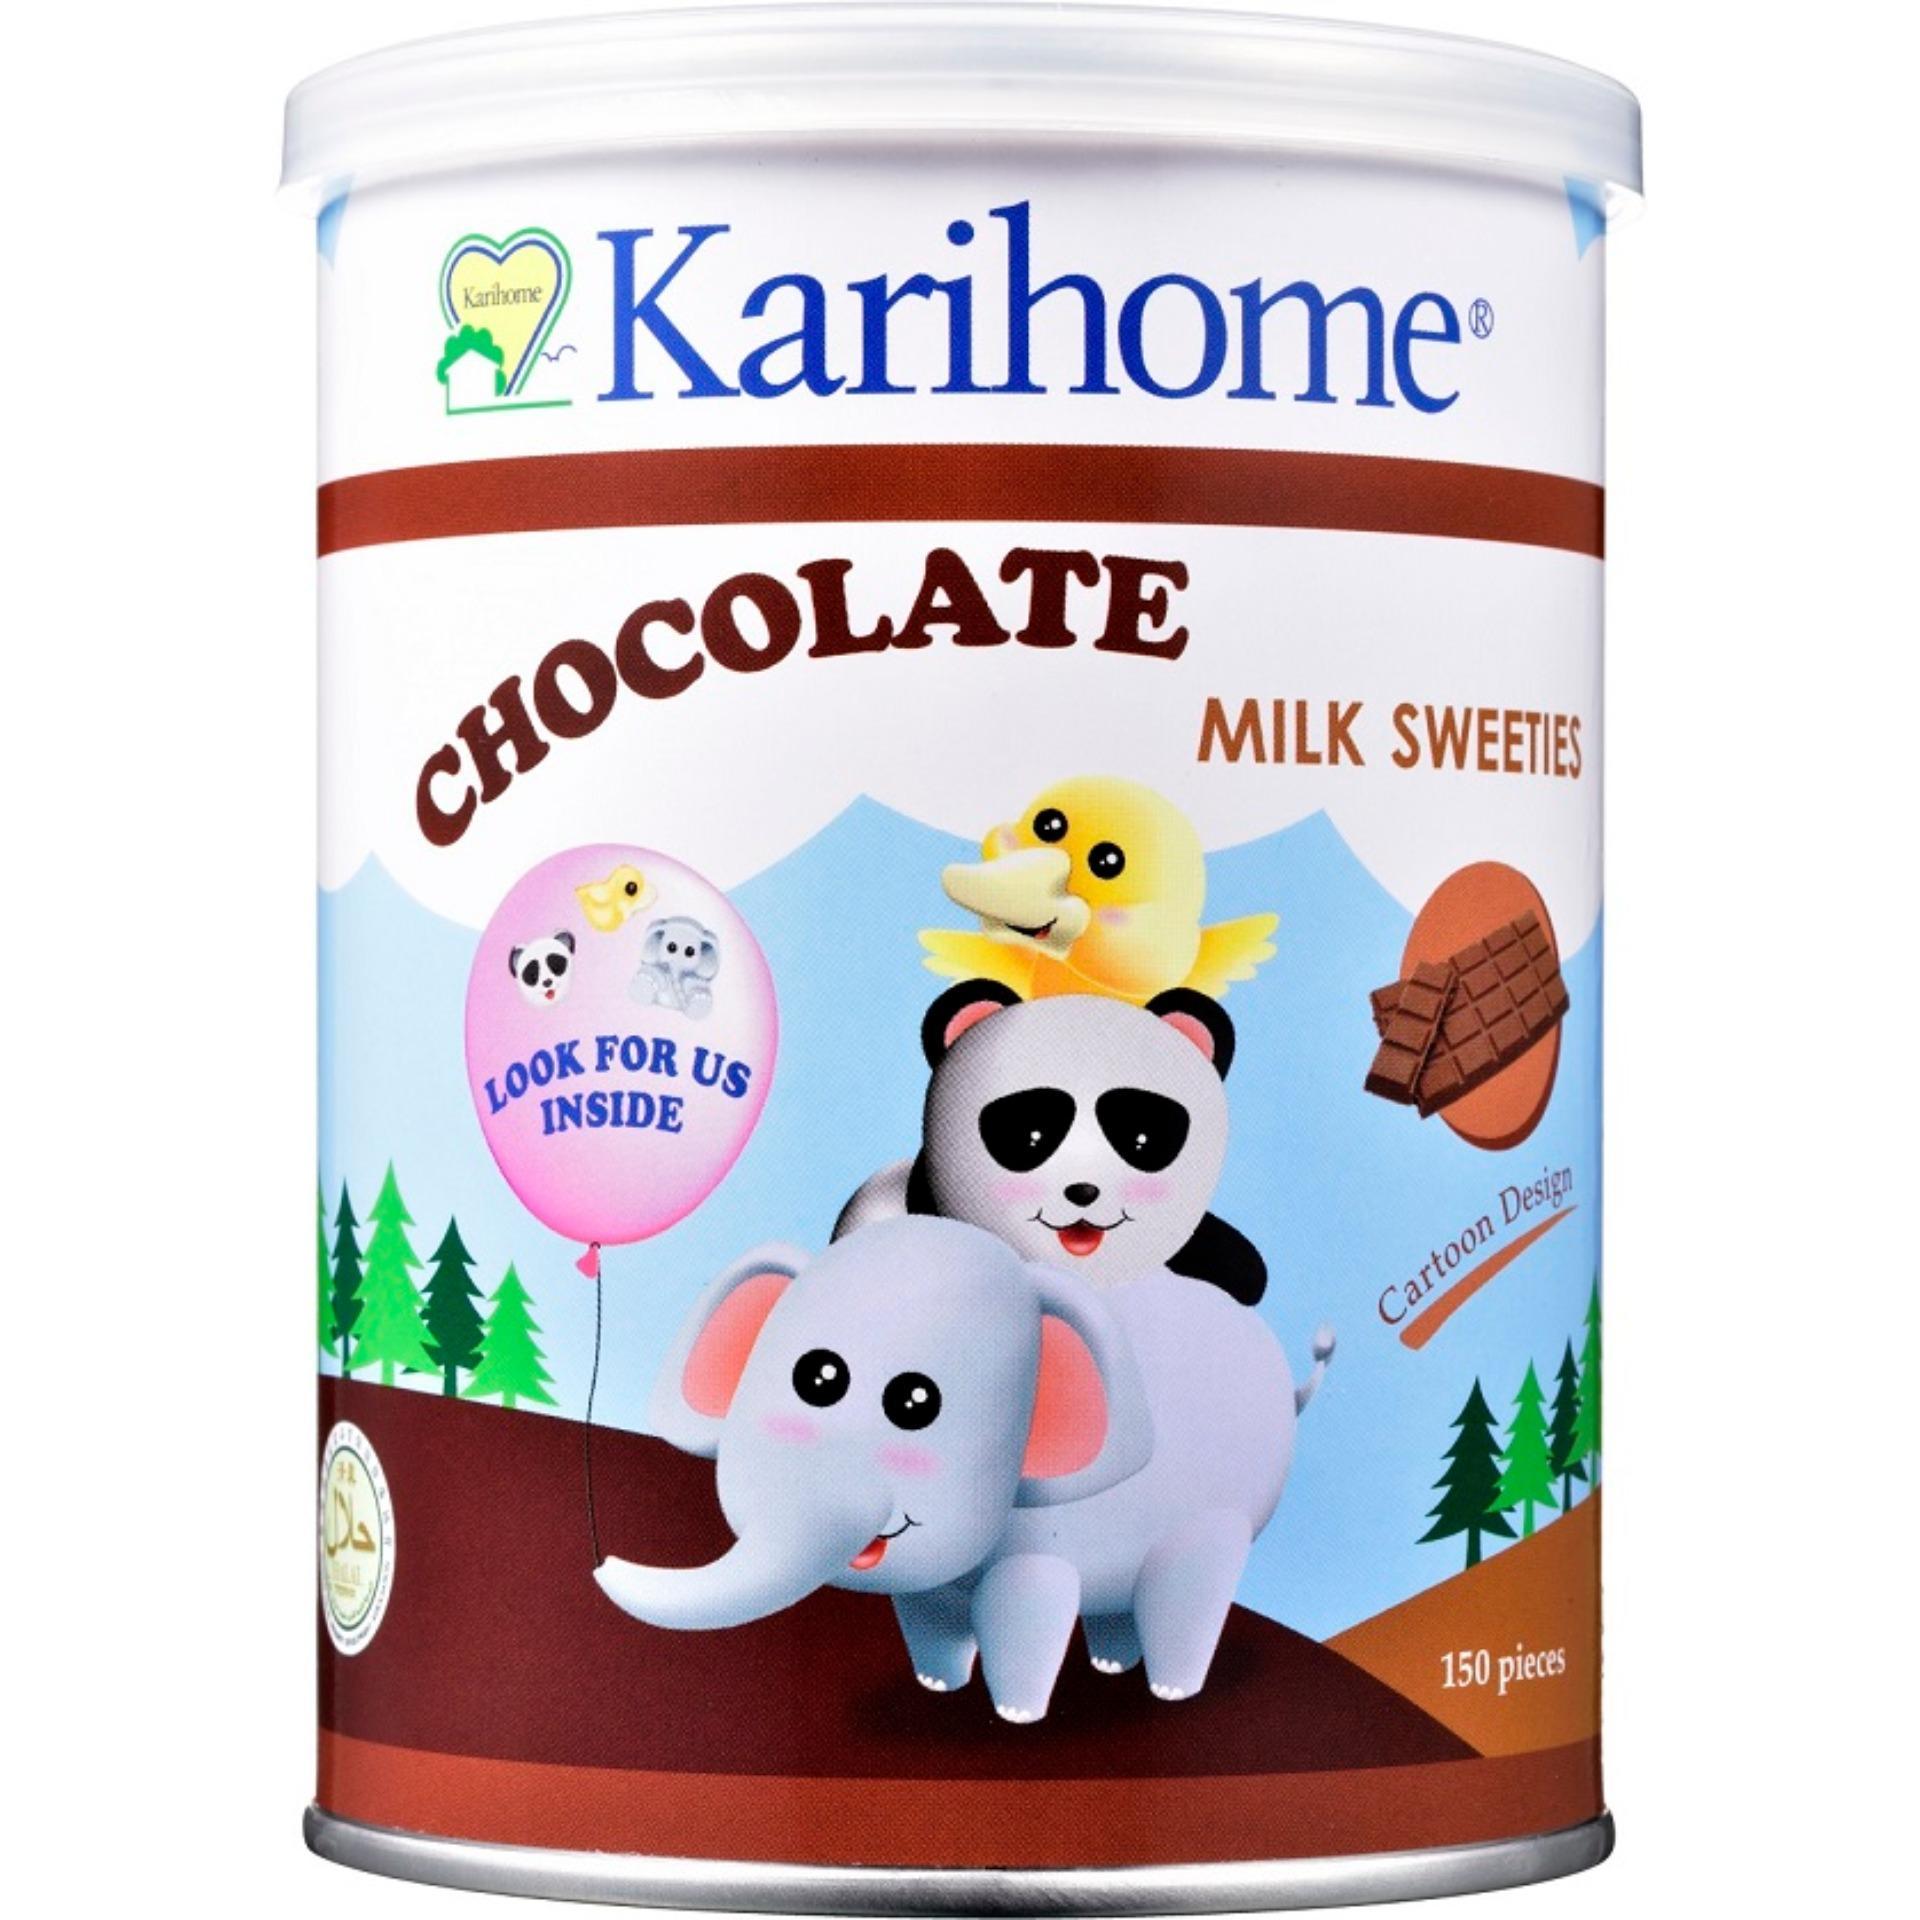 Karihome Sweeties - Chocolate By Lazada Retail Karihome Flagship Store.